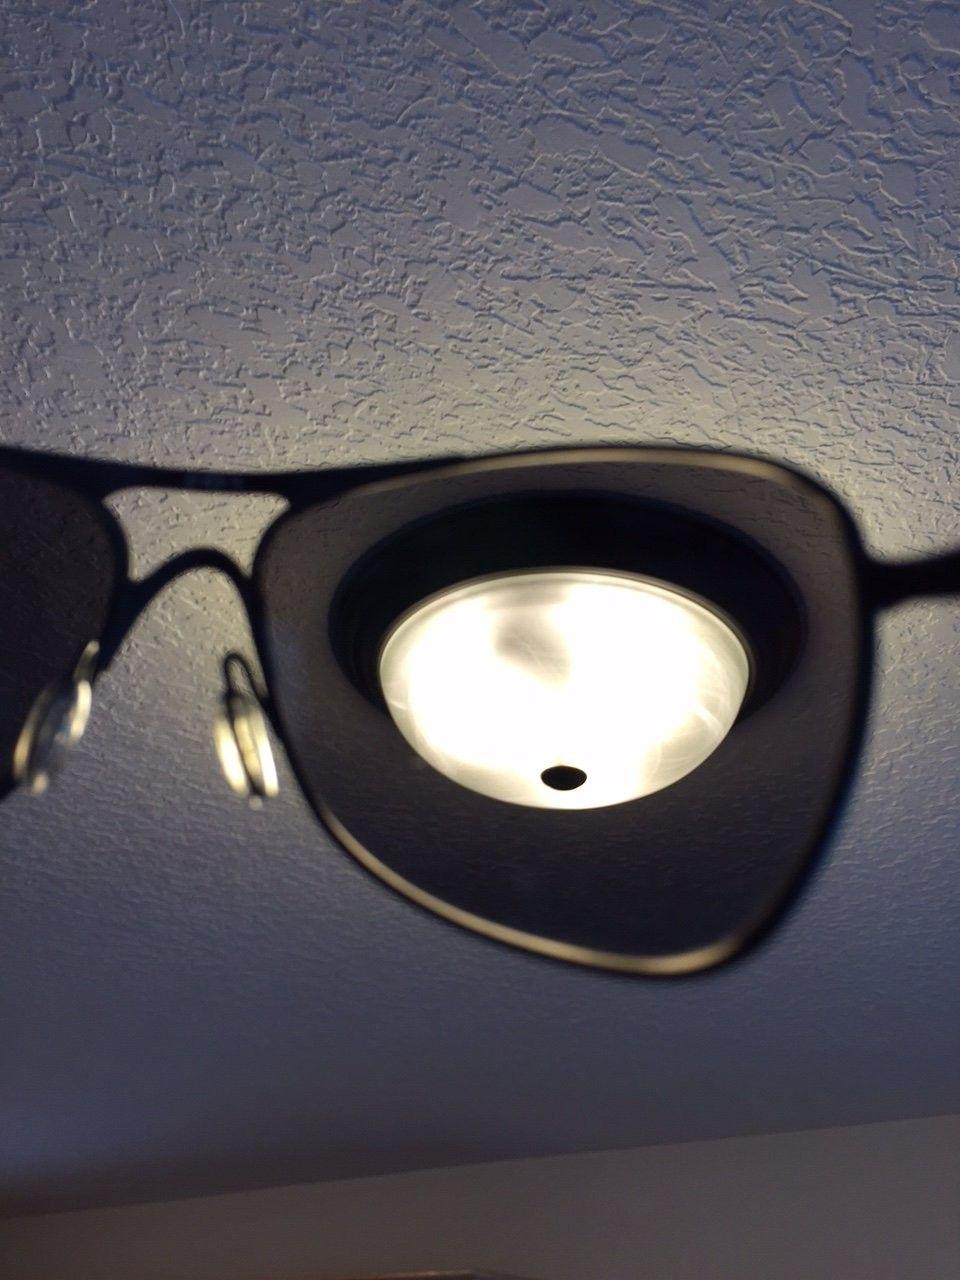 Crosshair - Matte Black/Black Iridium Sunglasses - IMG_5859.JPG